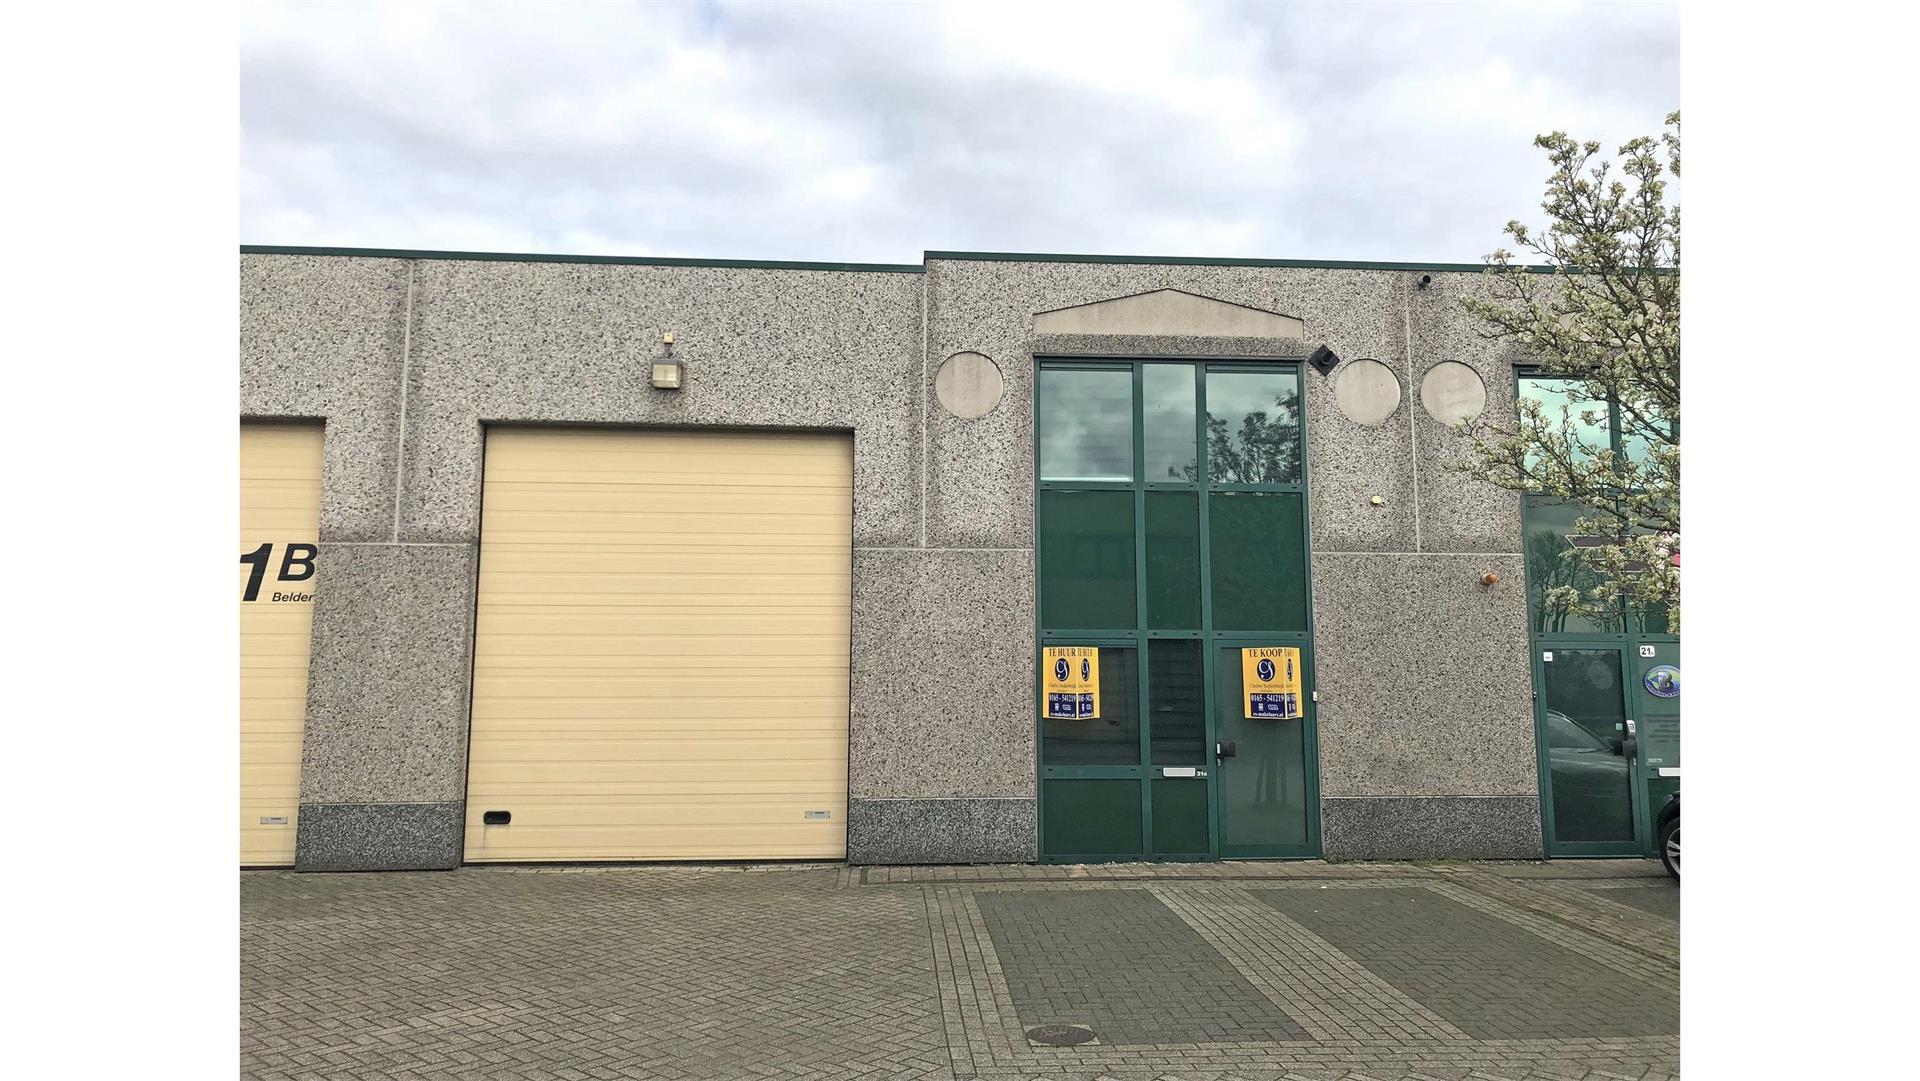 c45dd32399b Belder 21C, Roosendaal, Bedrijfsruimte te Hu...